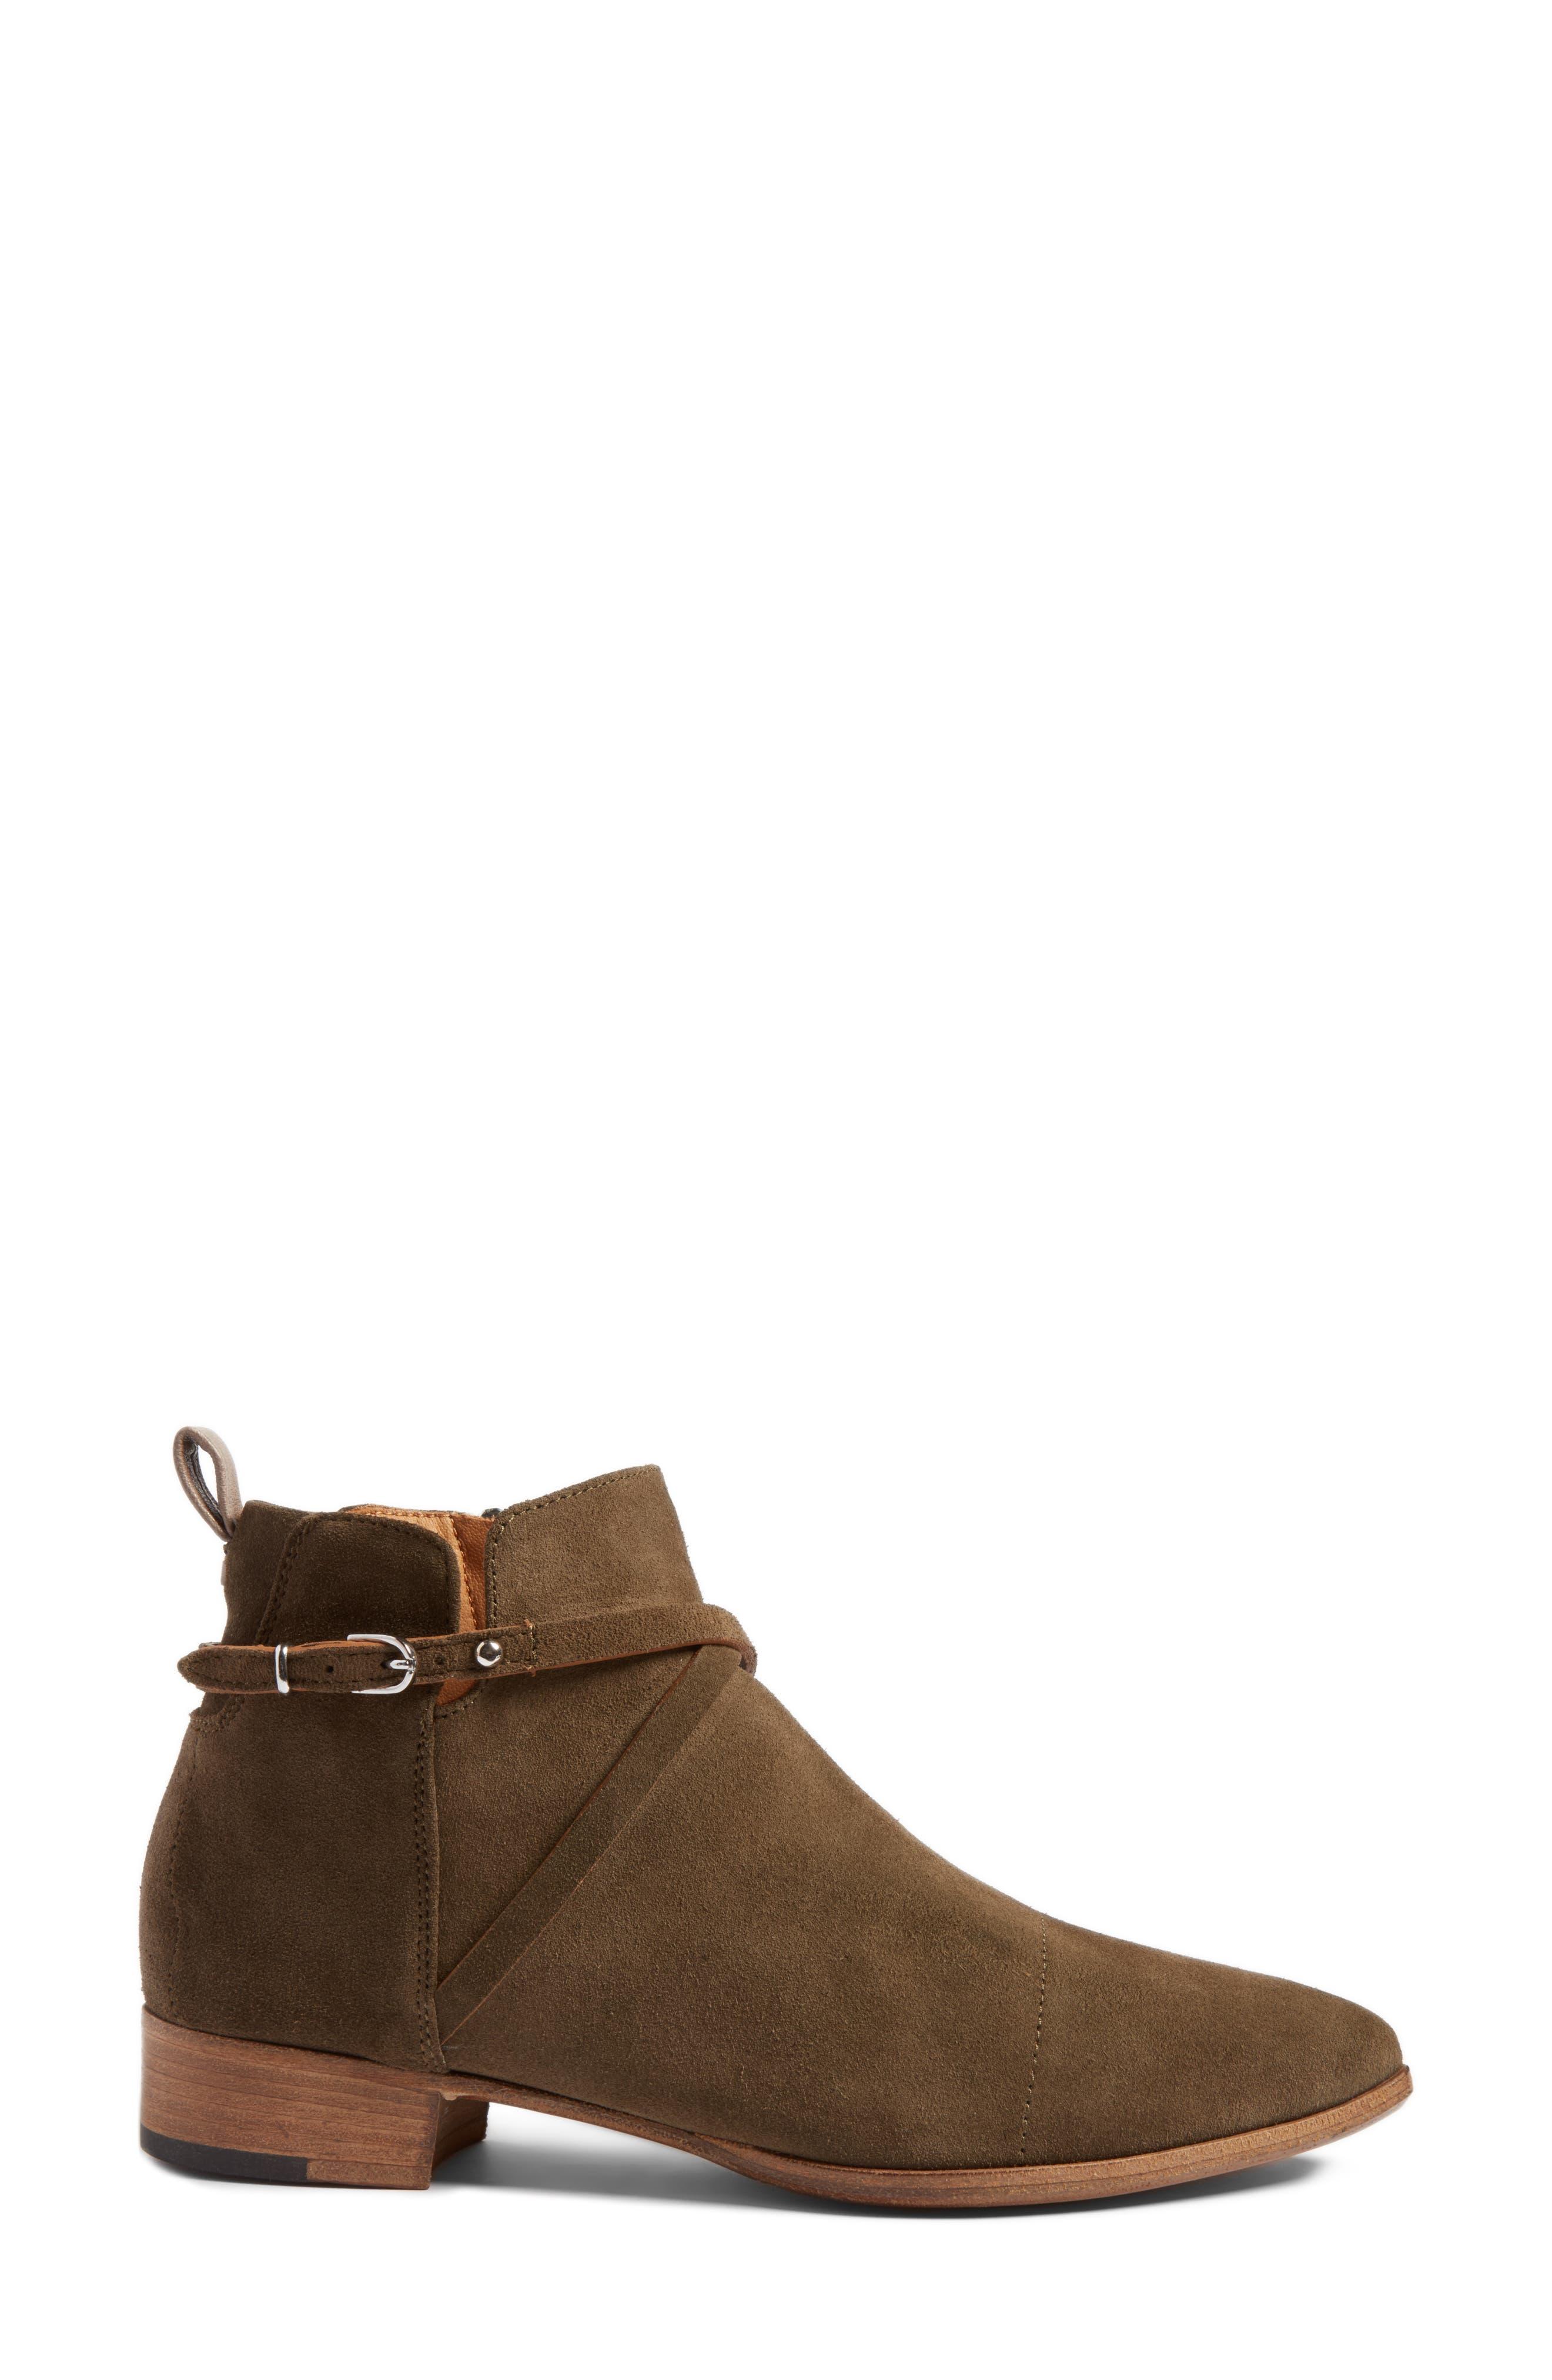 Alternate Image 3  - Alberto Fermani 'Mea' Ankle Boot (Women) (Nordstrom Exclusive)